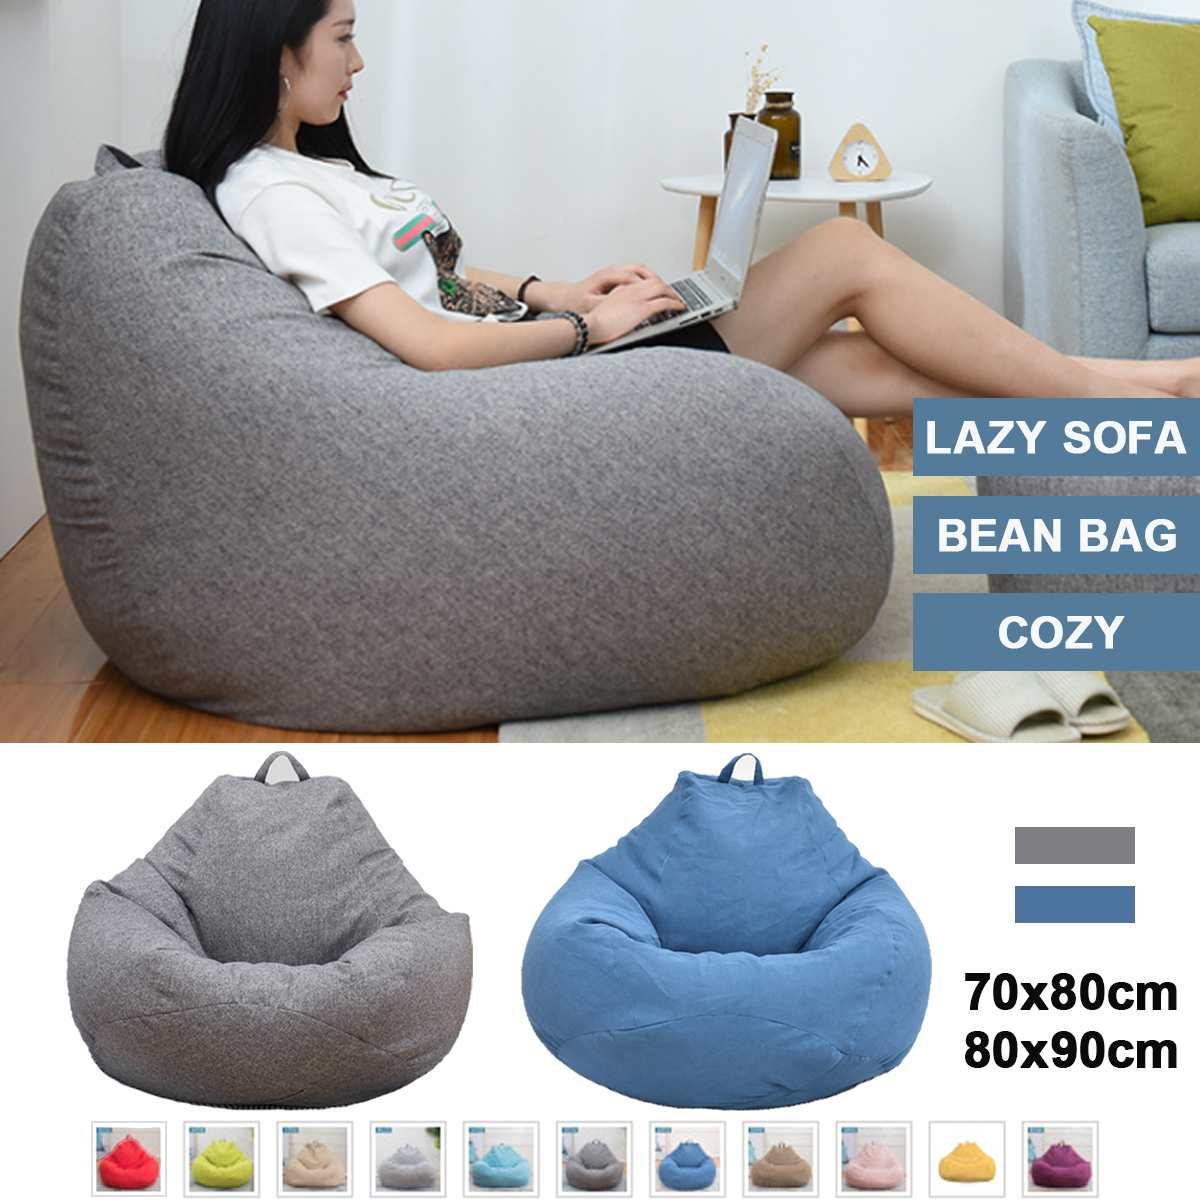 Enjoyable Best Top 10 Bean Sofa Bean Bags Ideas And Get Free Shipping Machost Co Dining Chair Design Ideas Machostcouk